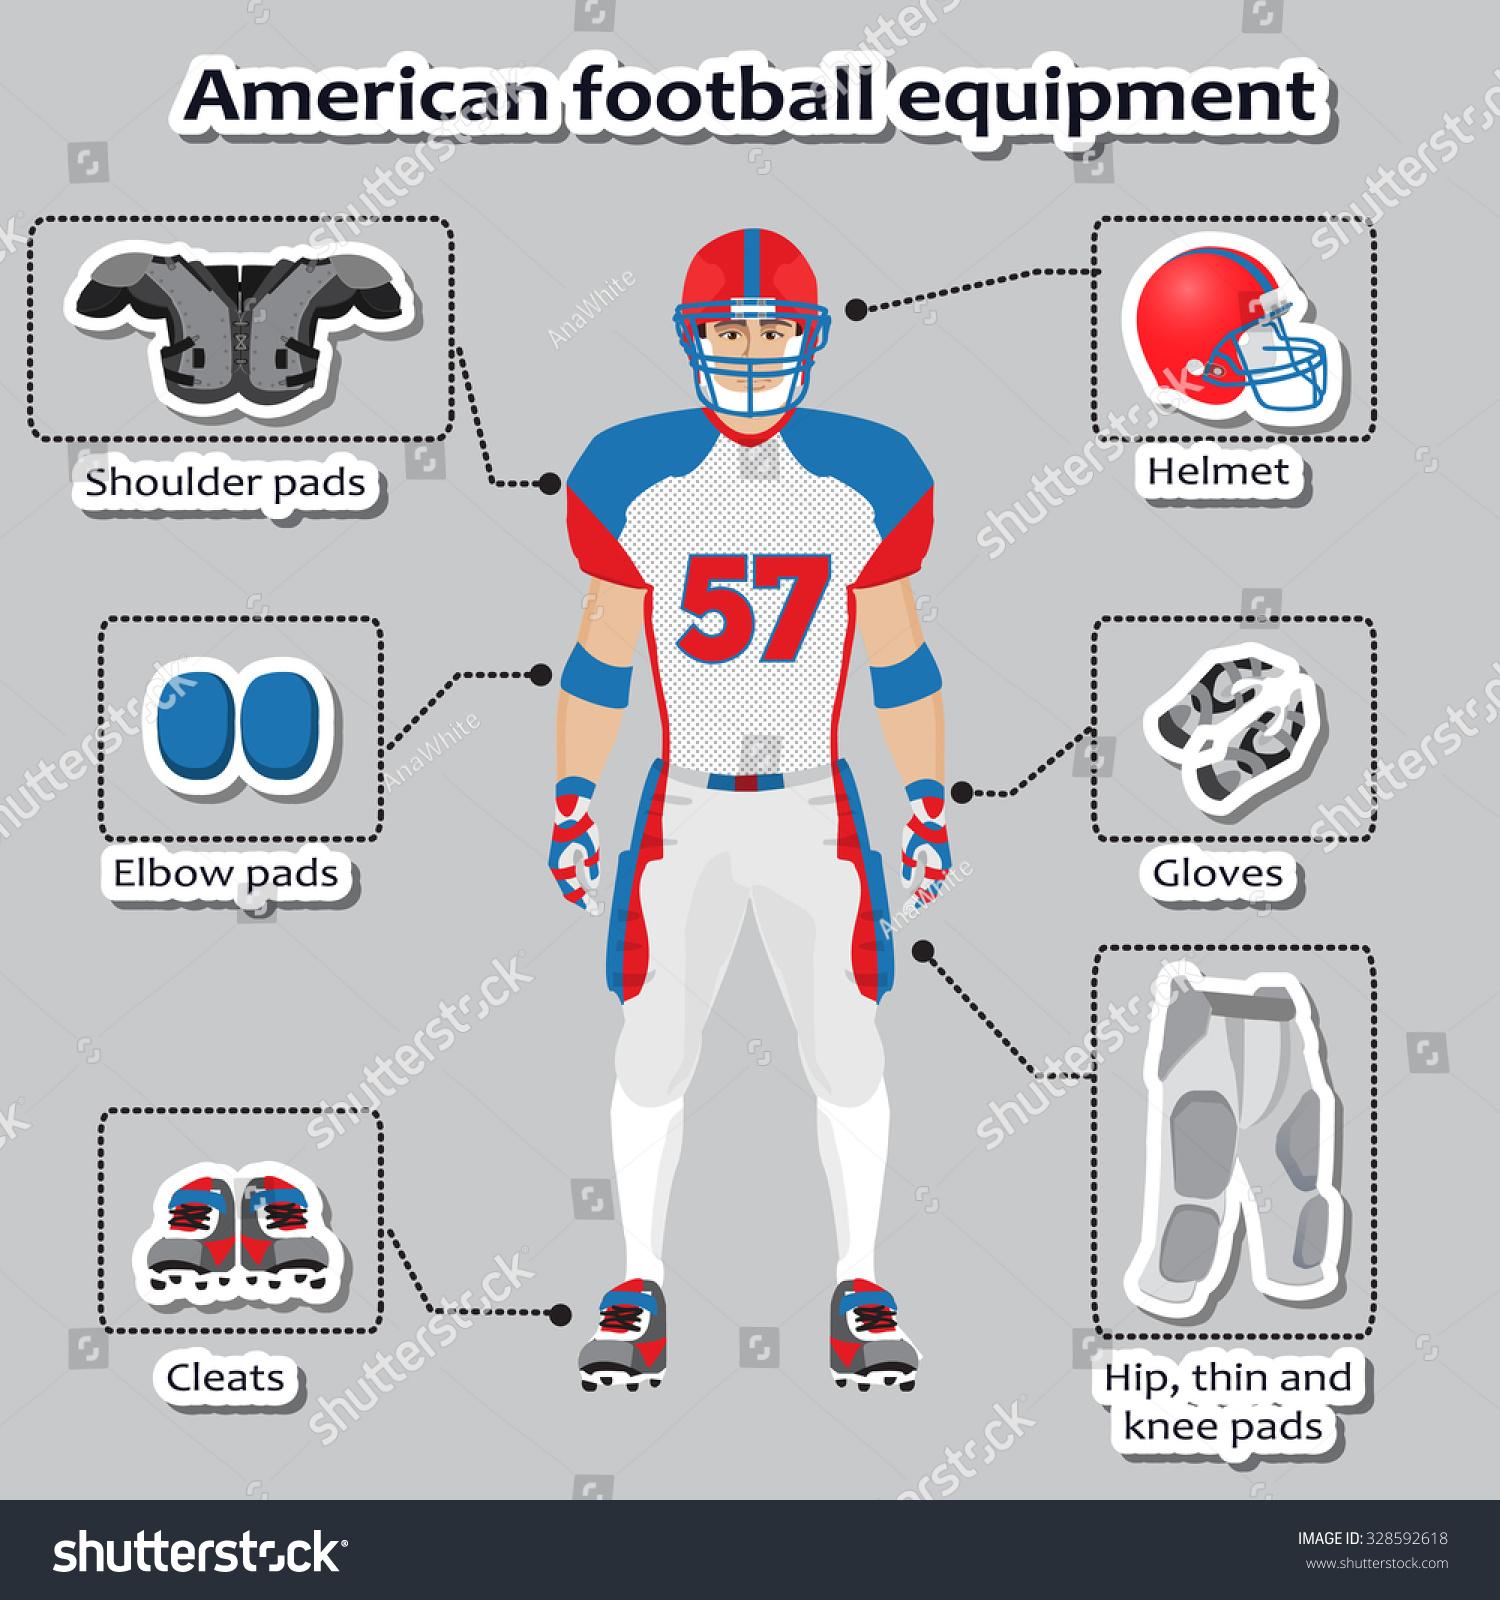 Football Safety Equipment